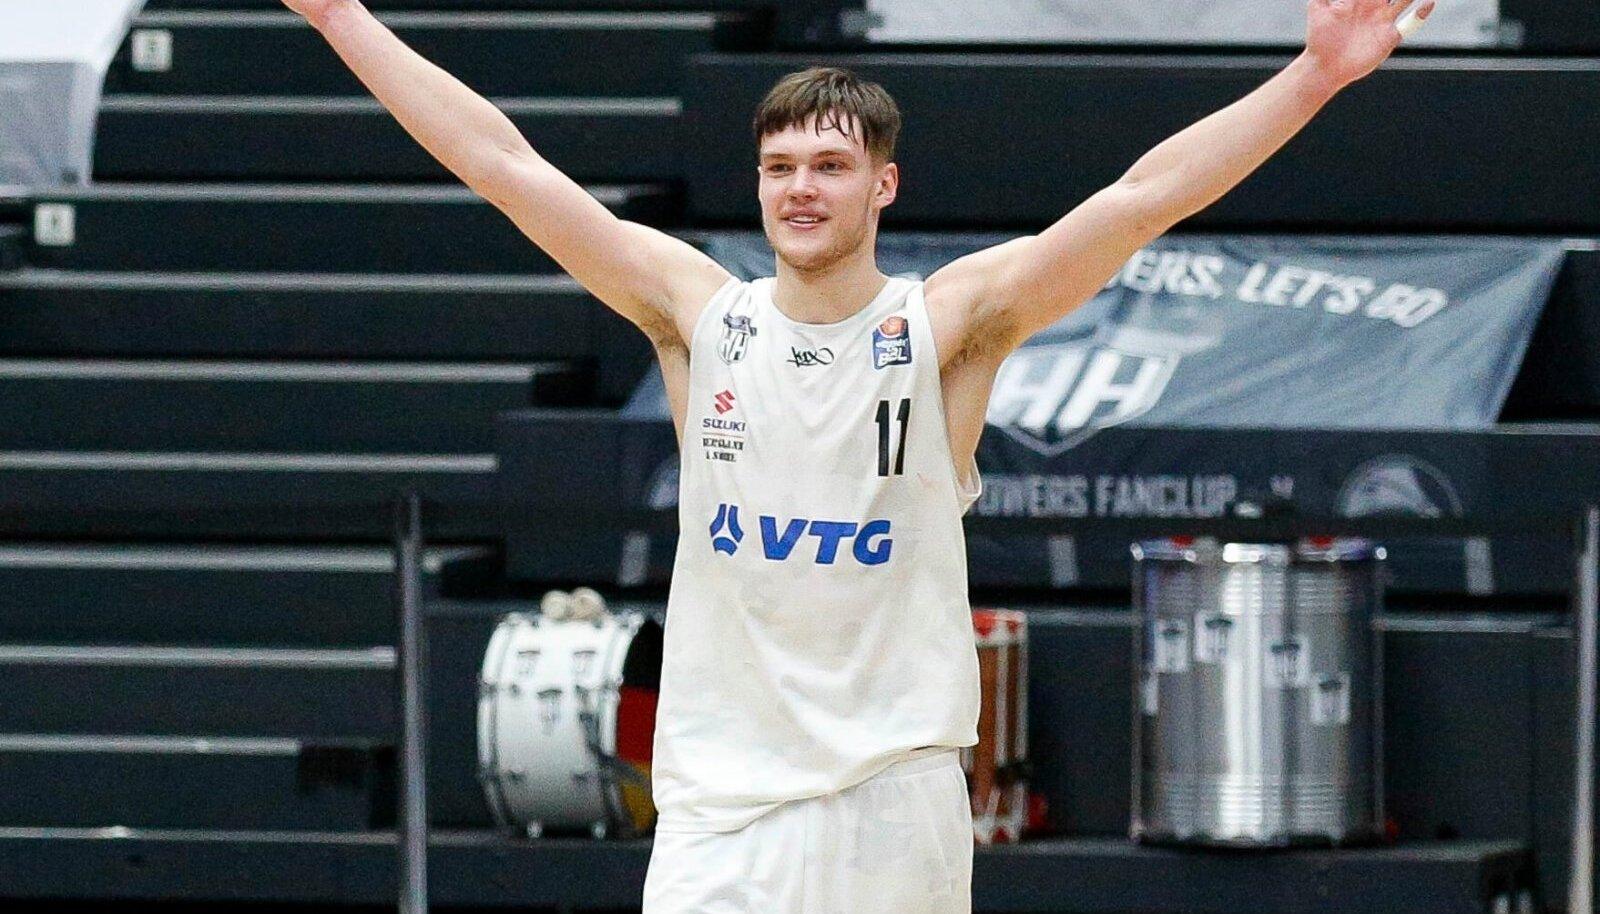 BBL easyCredit Basketball Bundesliga Saison 2020/2021 25. Spieltag am Samstag, 27. Maerz 2021 in der edel-optics.de Are